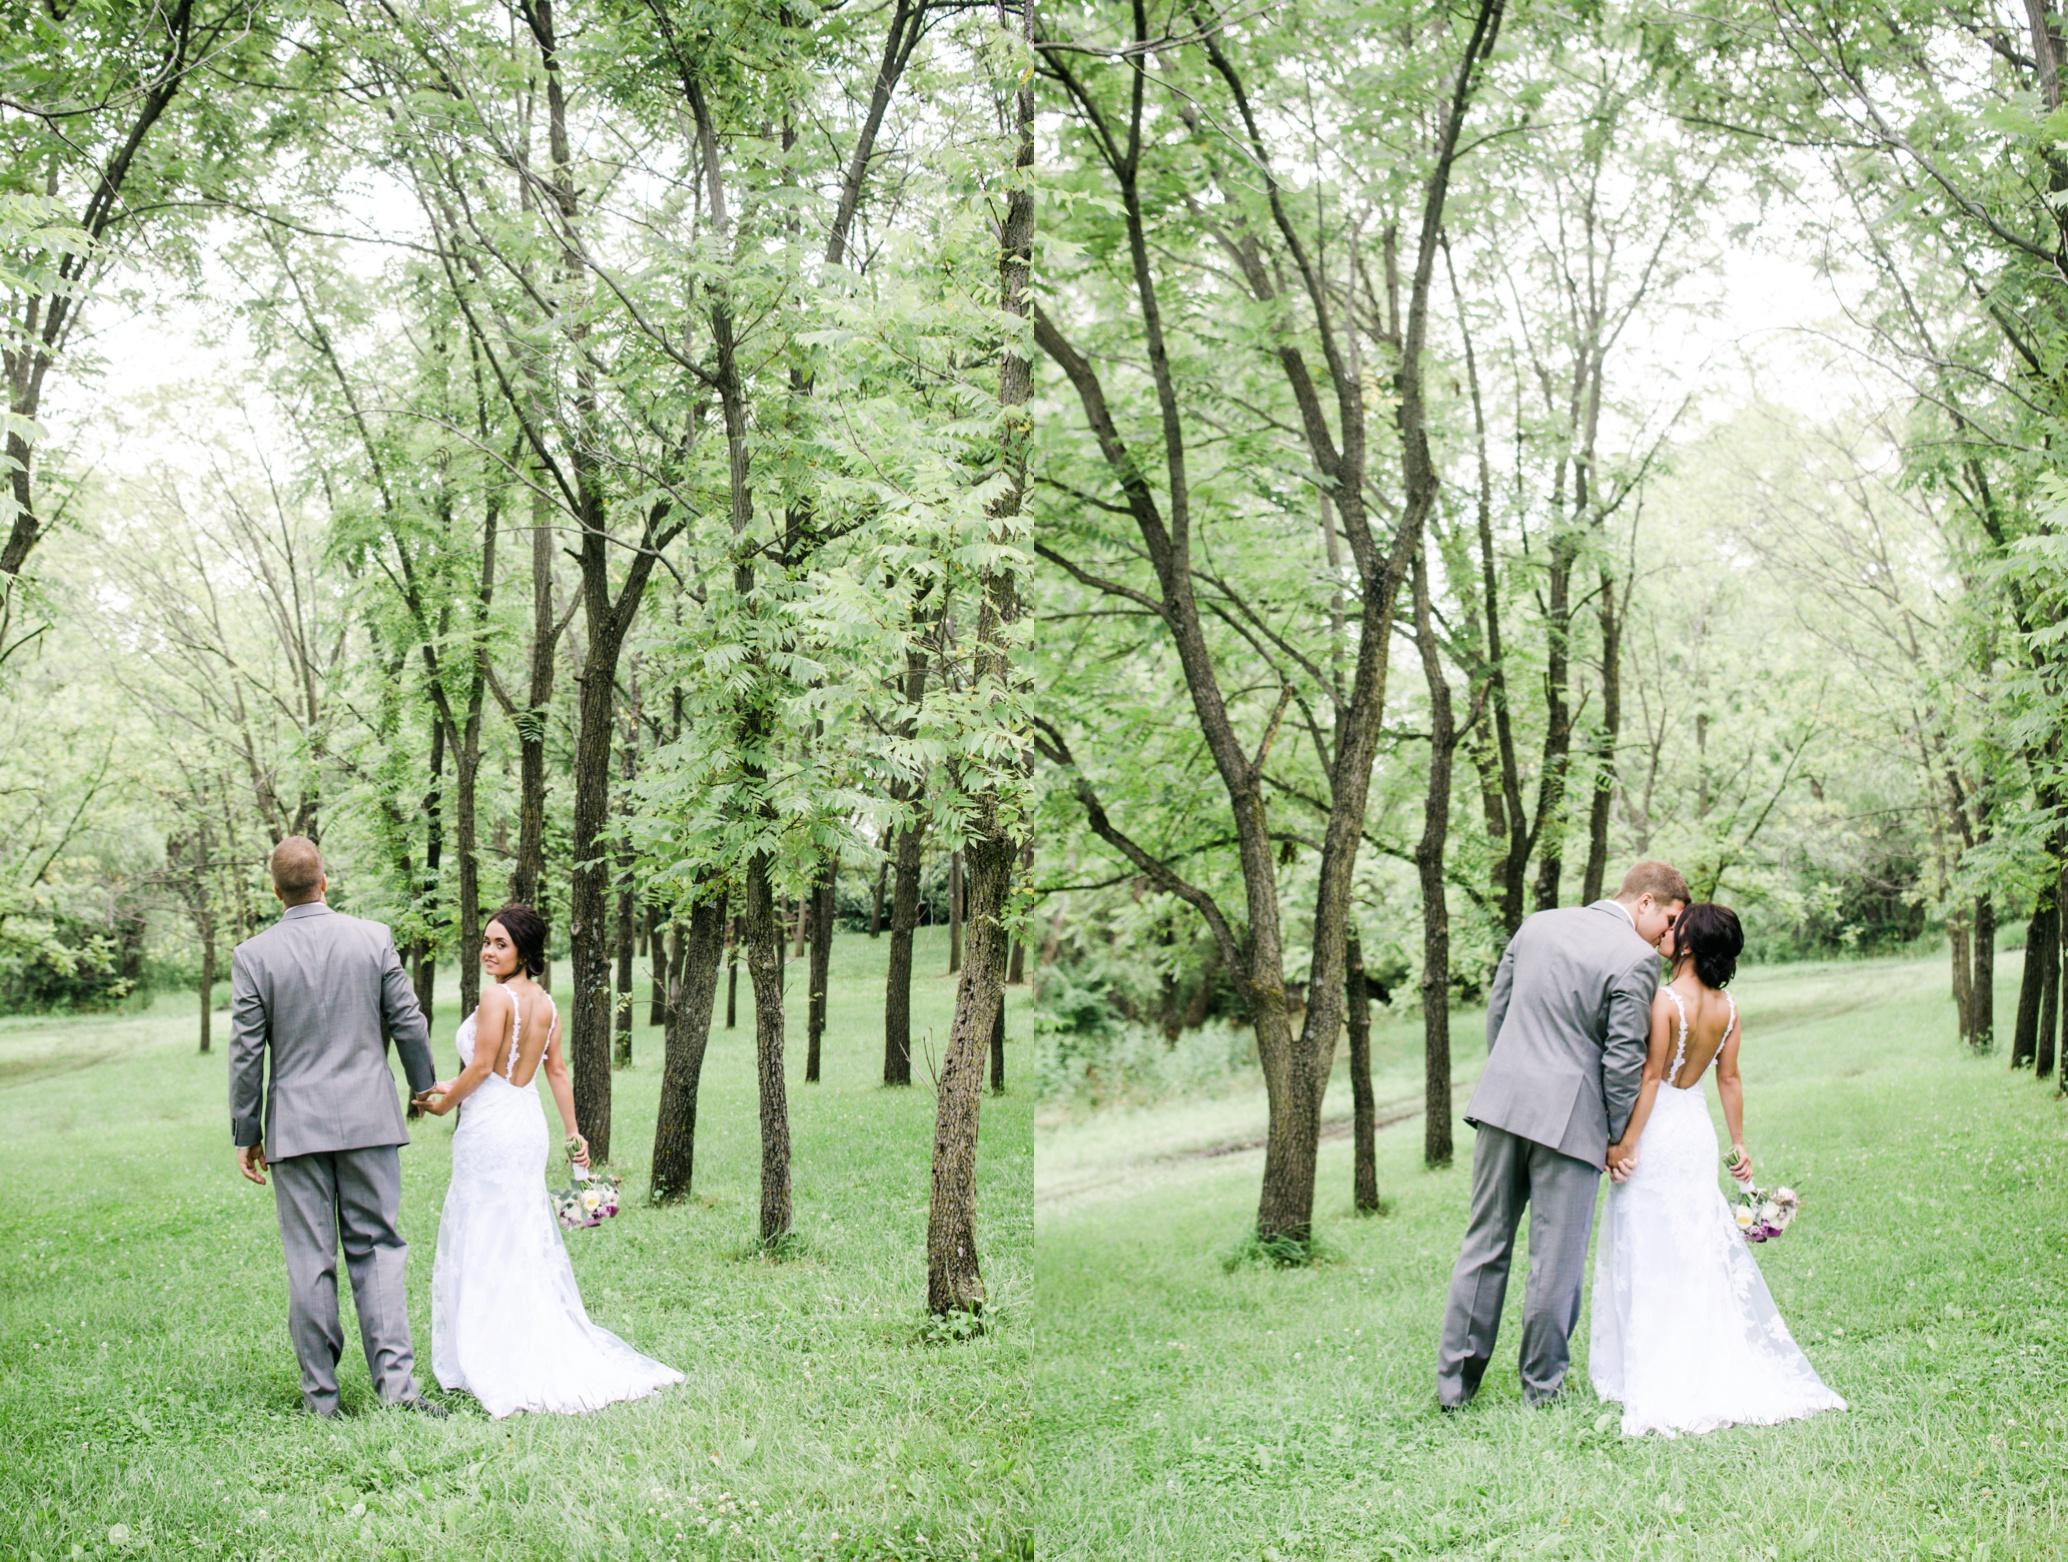 Barnes' Place Rustic Outdoor Wedding | Ali Leigh Photo Minneapolis Wedding Photographer_0152.jpg